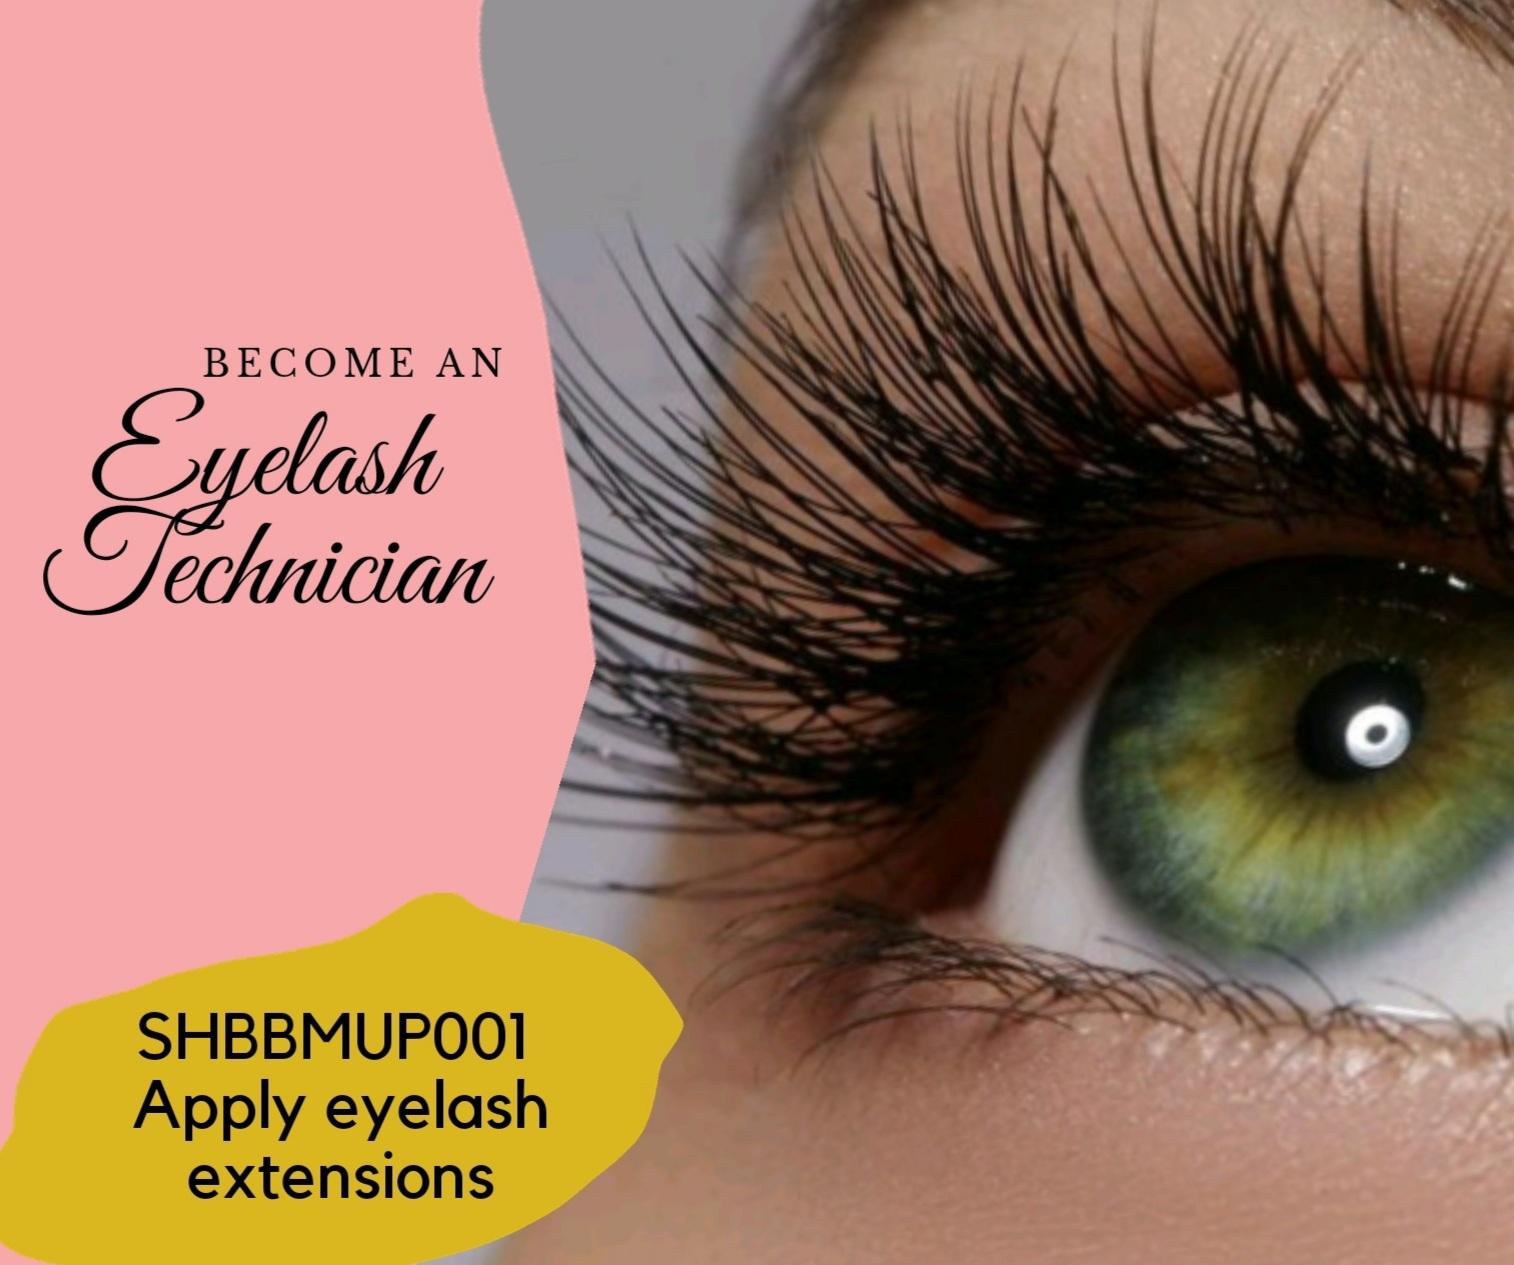 Apply eyelash extensions